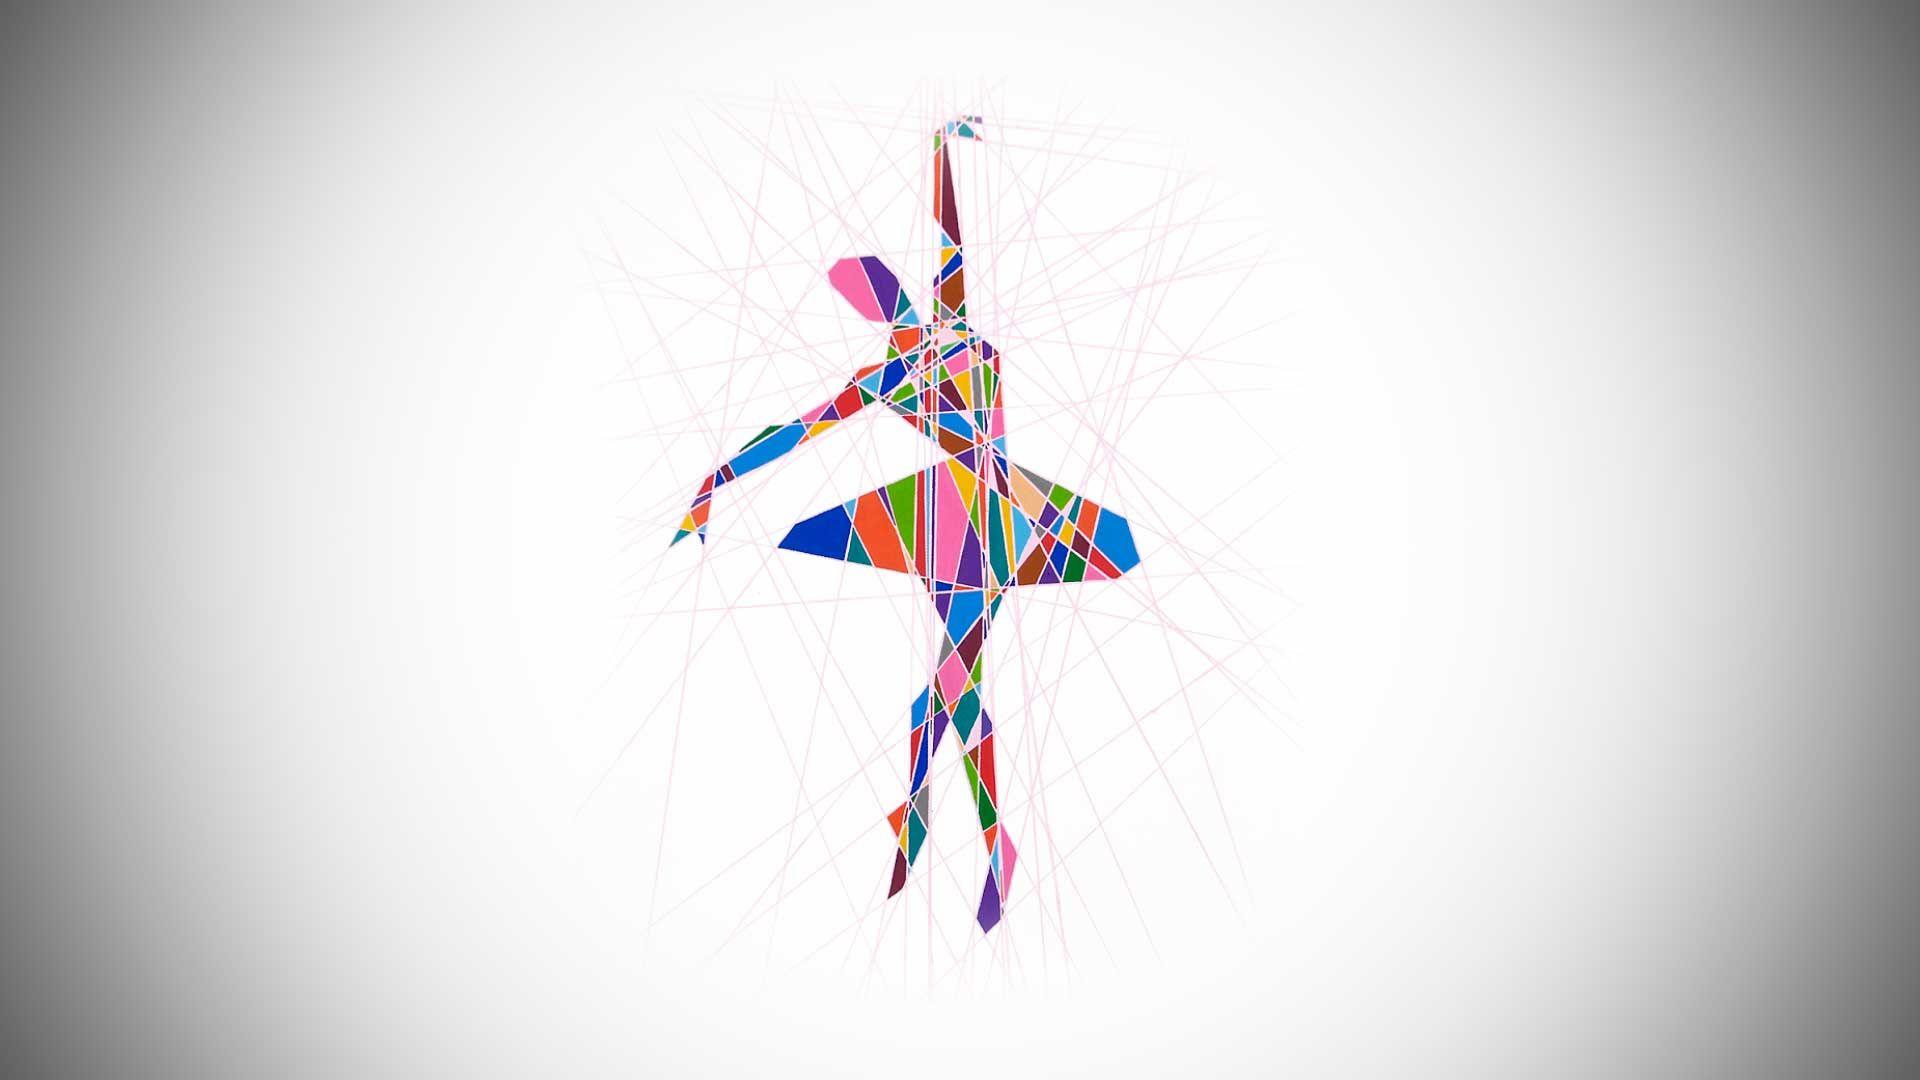 Julien Wenger El Diseño Convertido En Arte Waarket